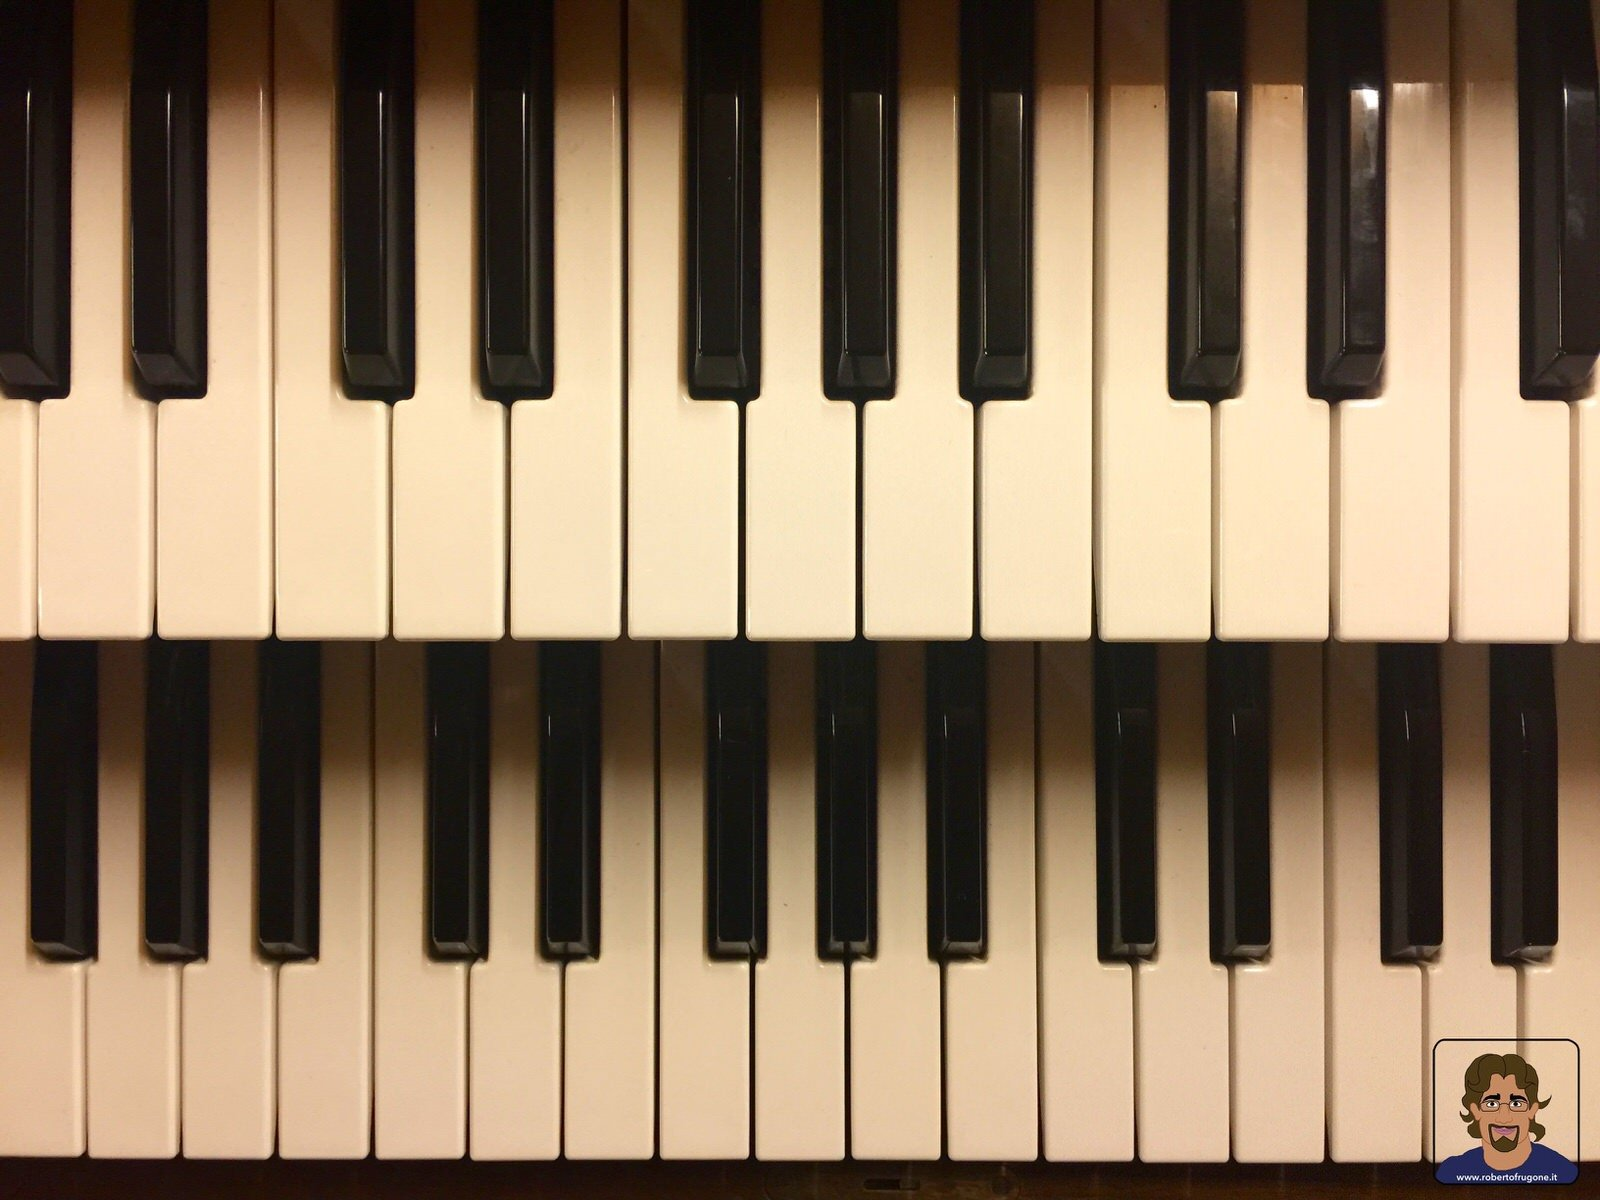 Totem Studio Sala Prove Musicali Casarza Ligure tastiere